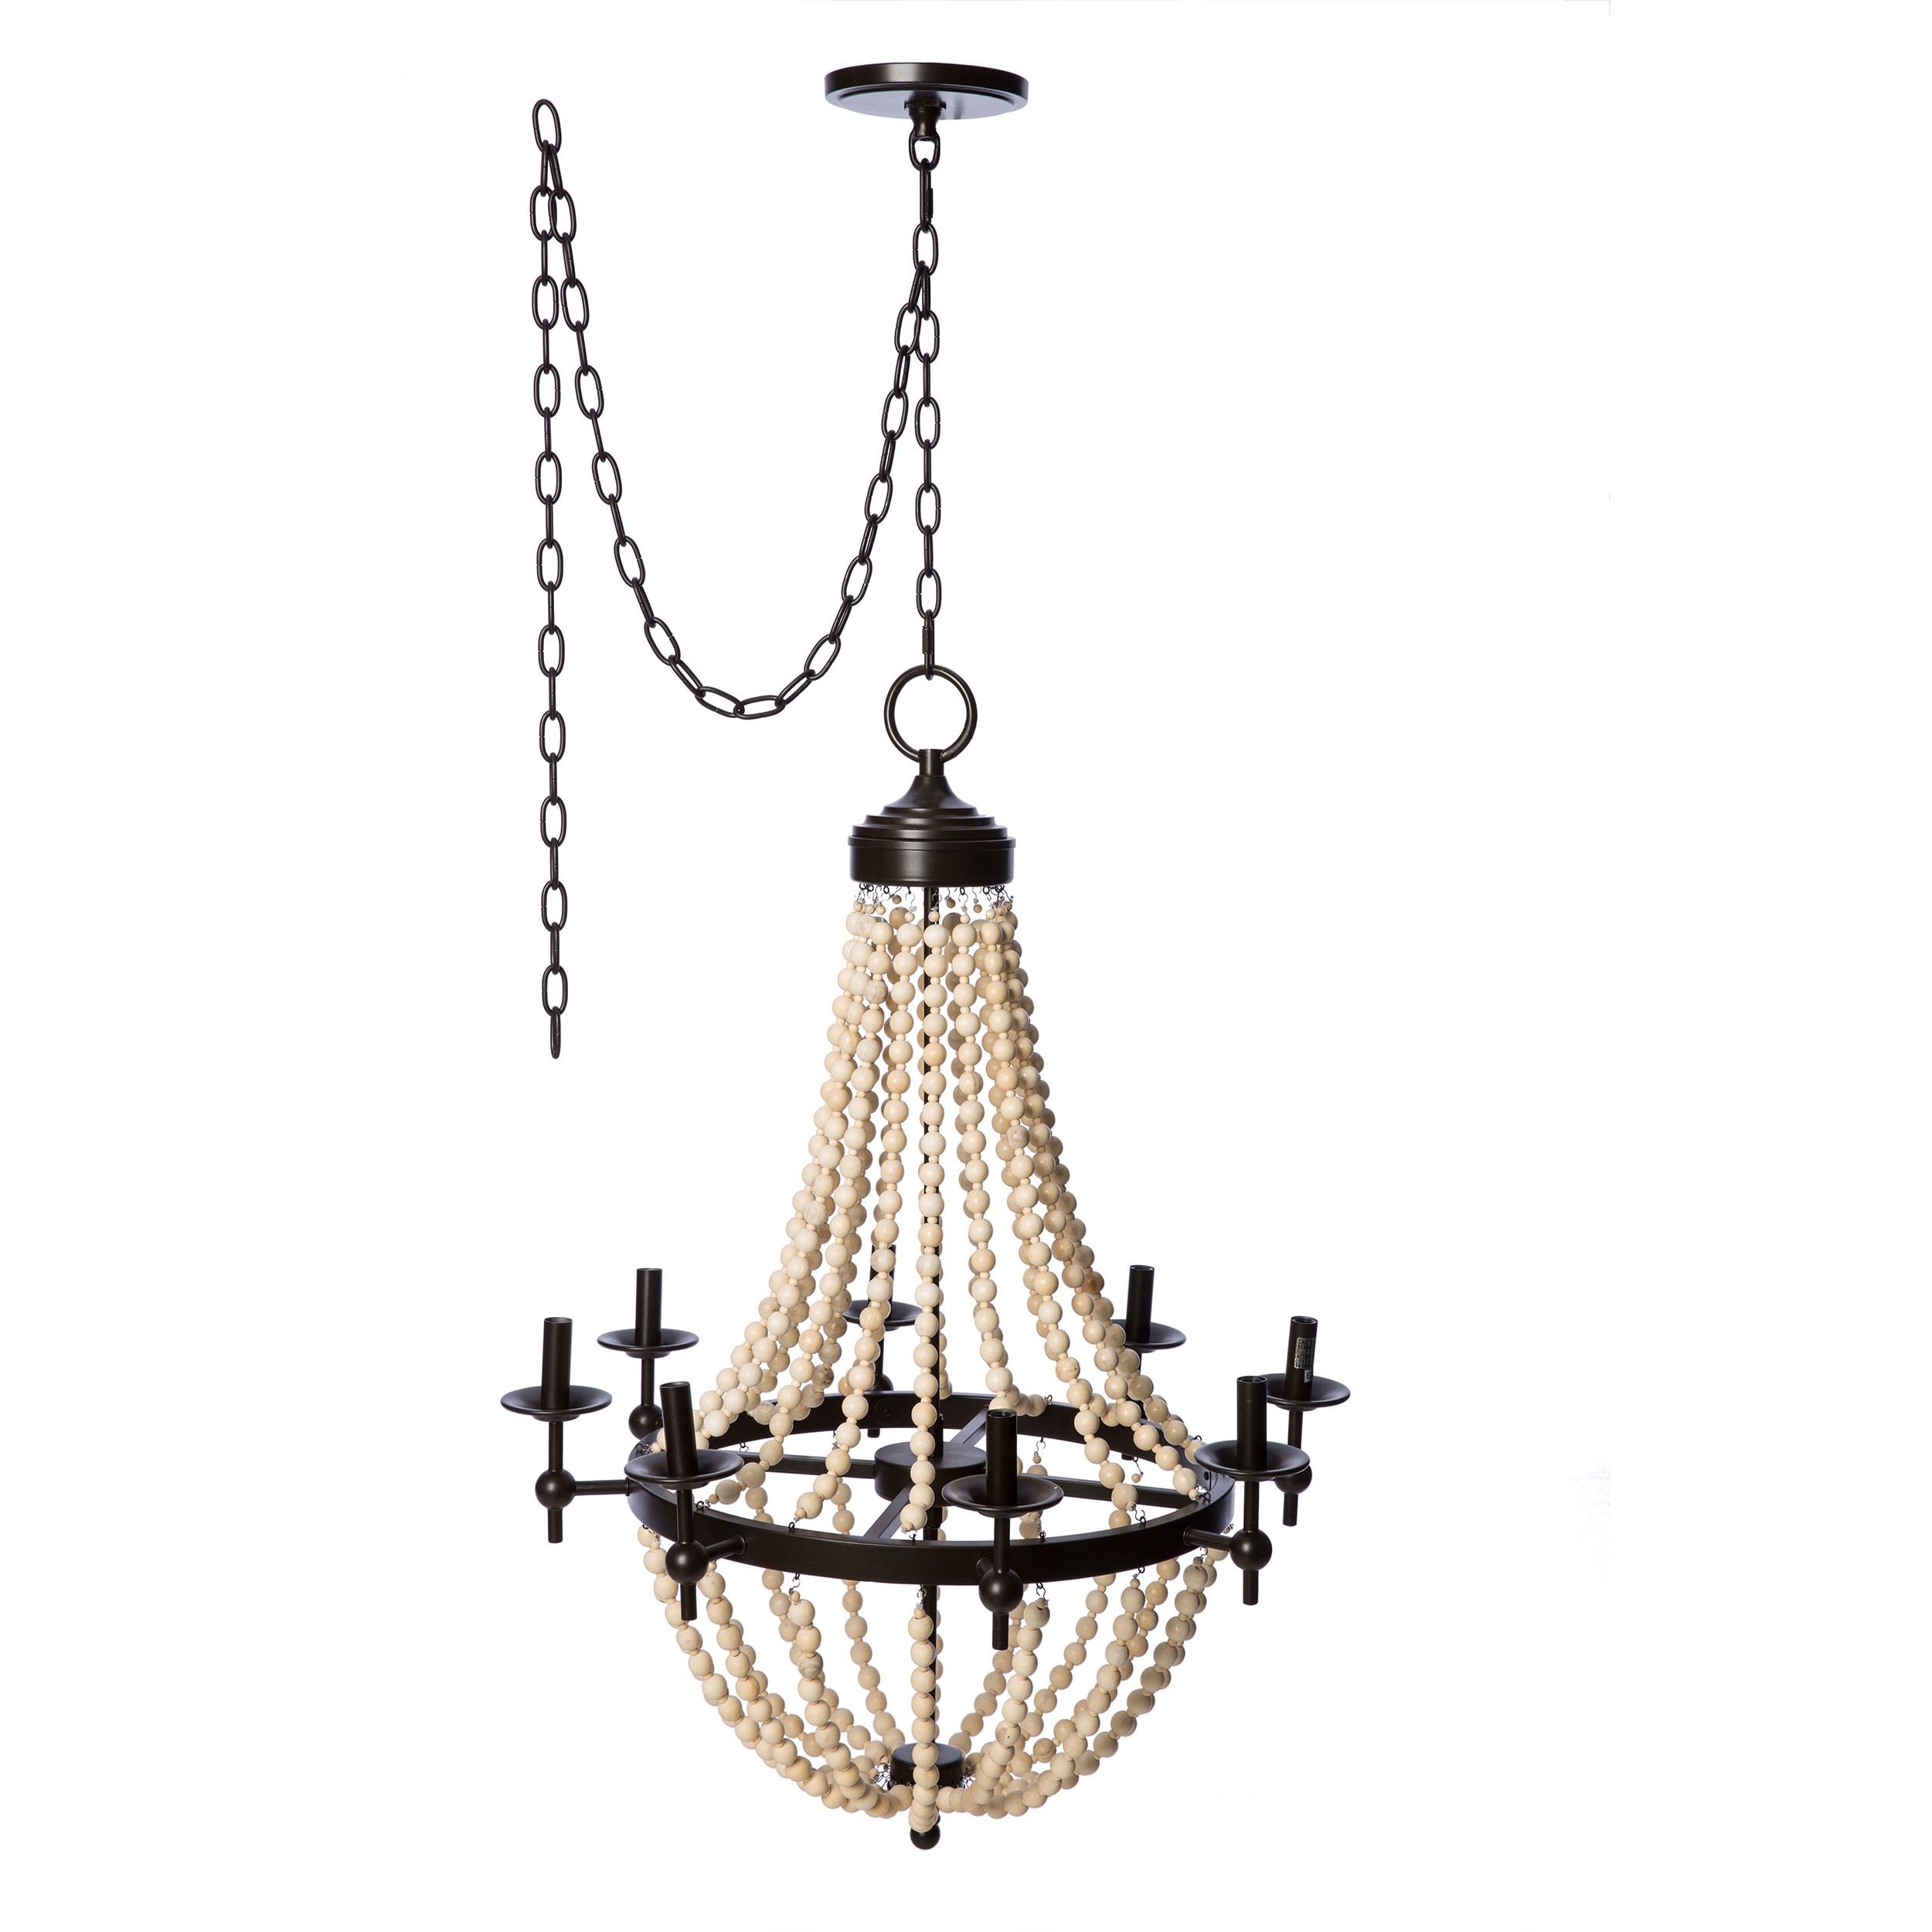 black chandelier b & q : Chandelier Gallery